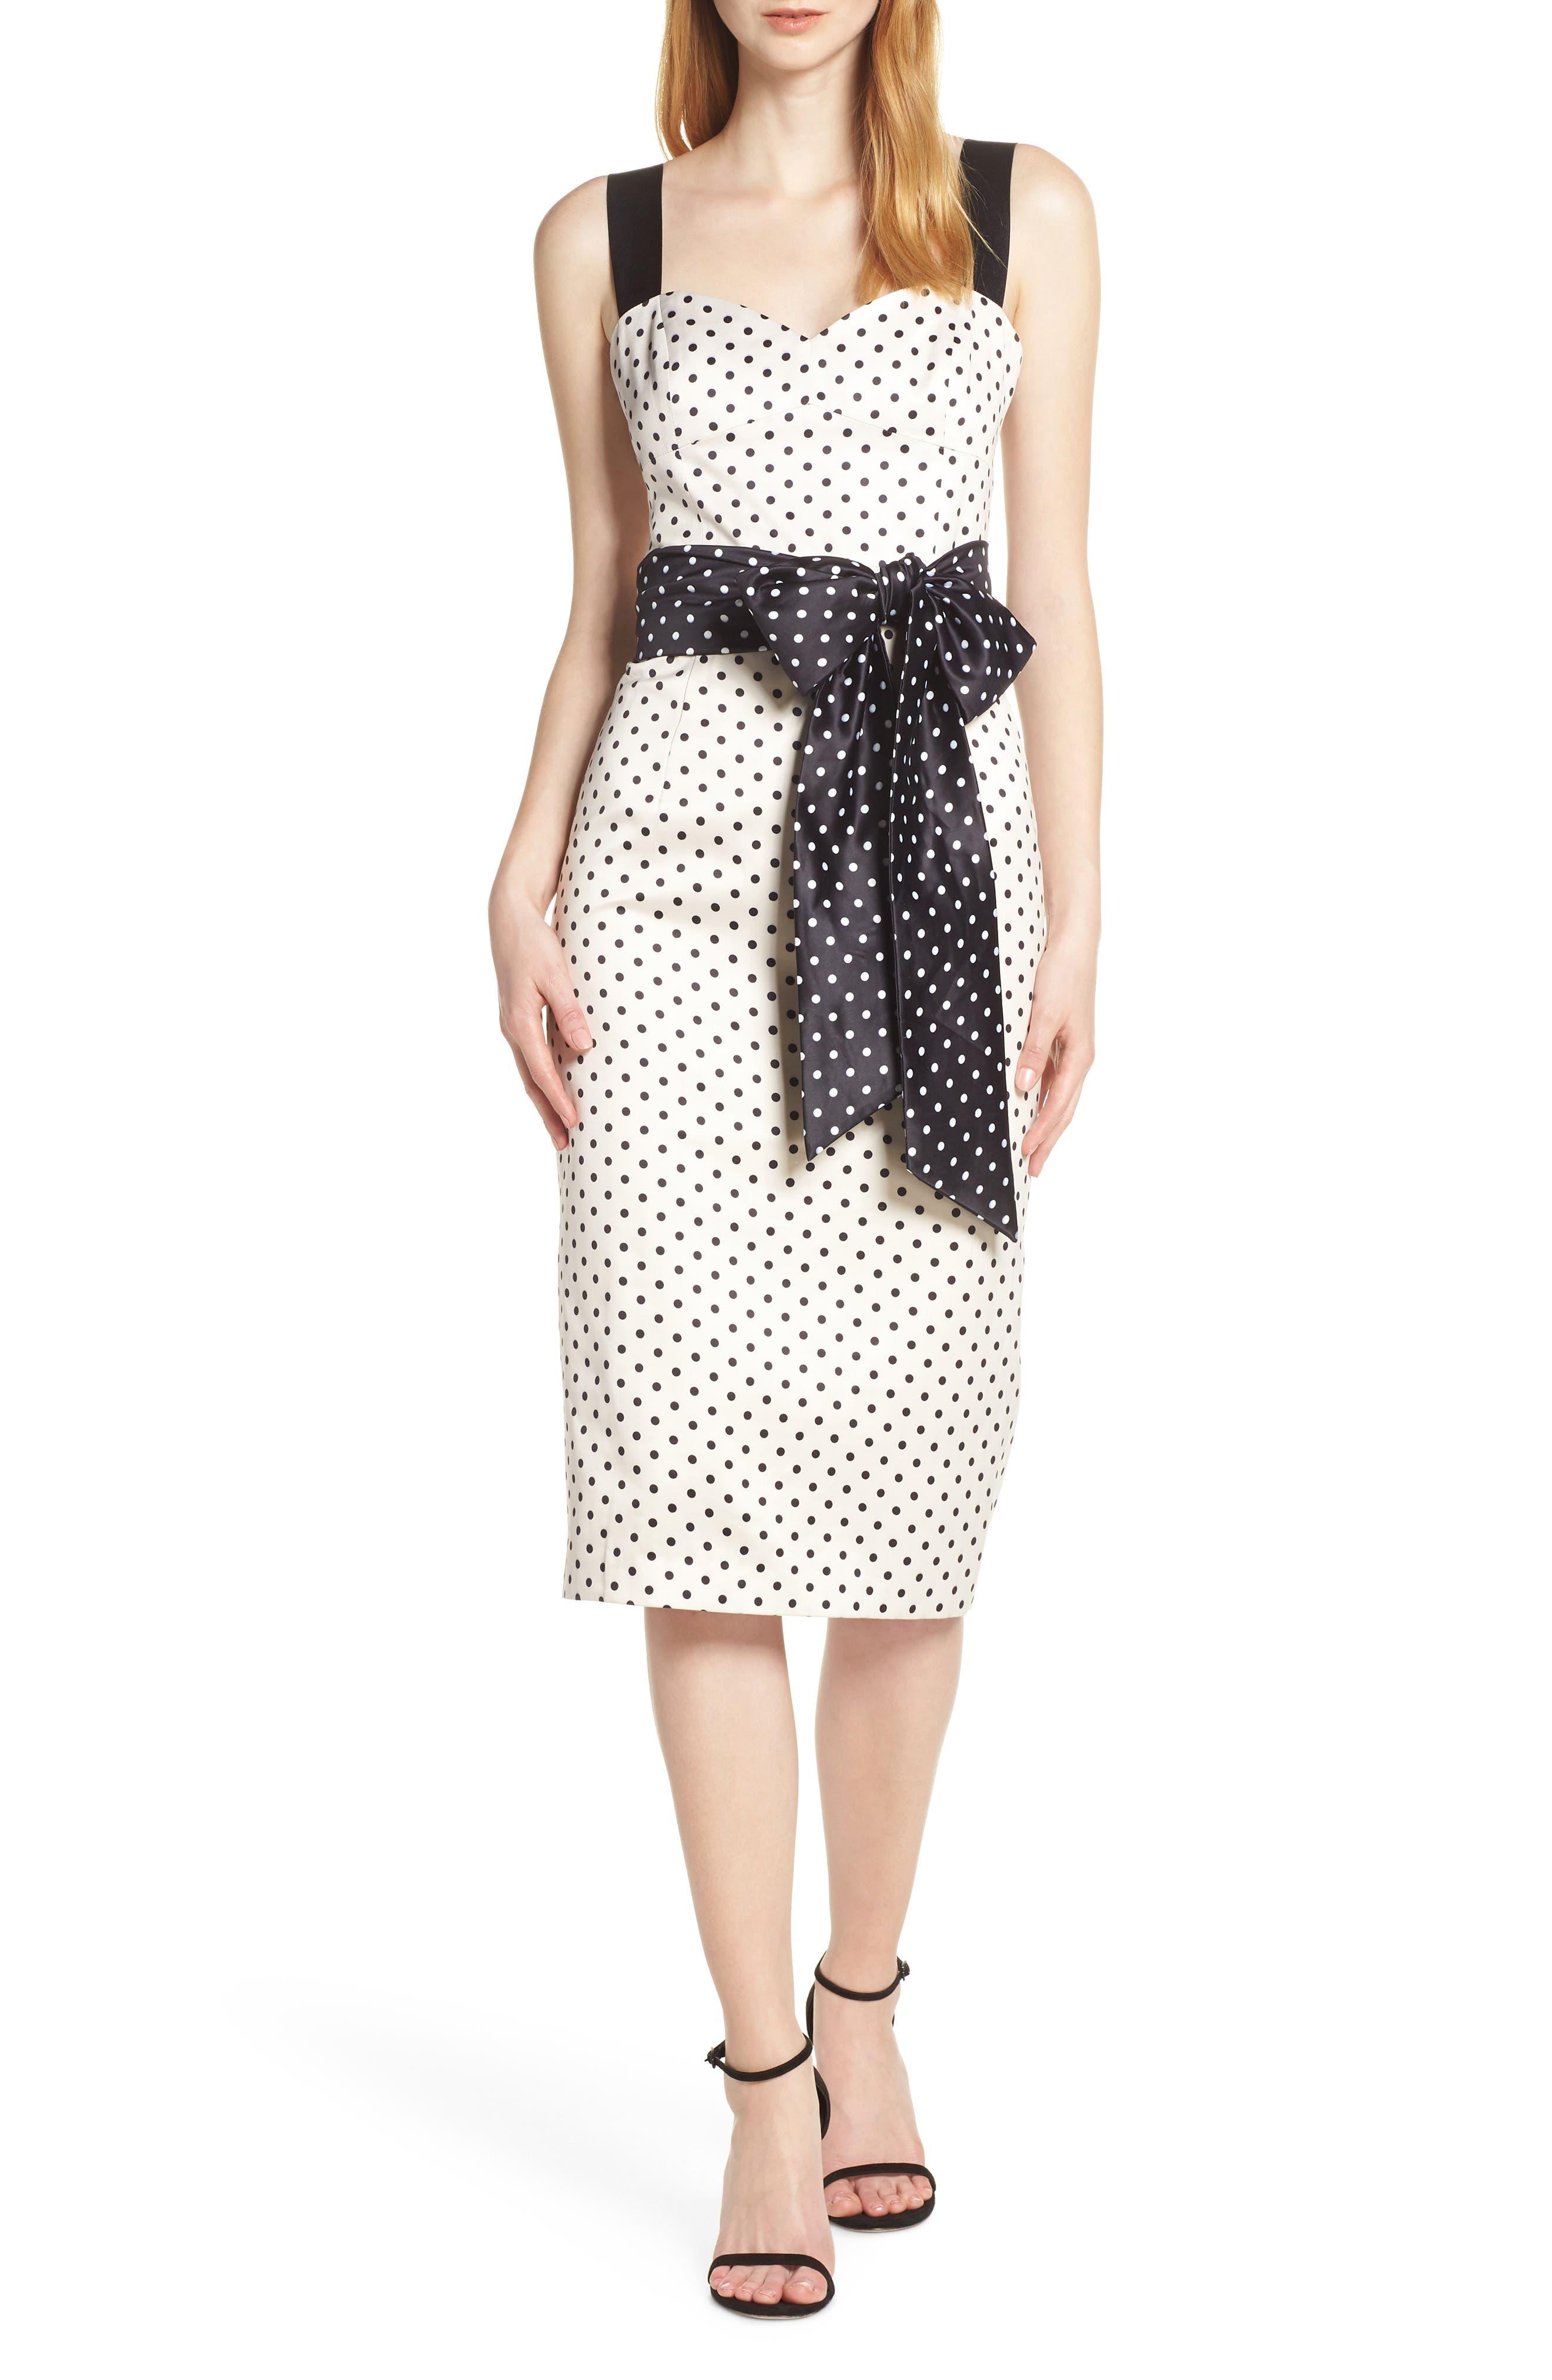 Bronx And Banco Morgan Sleeveless Pencil Dress, White